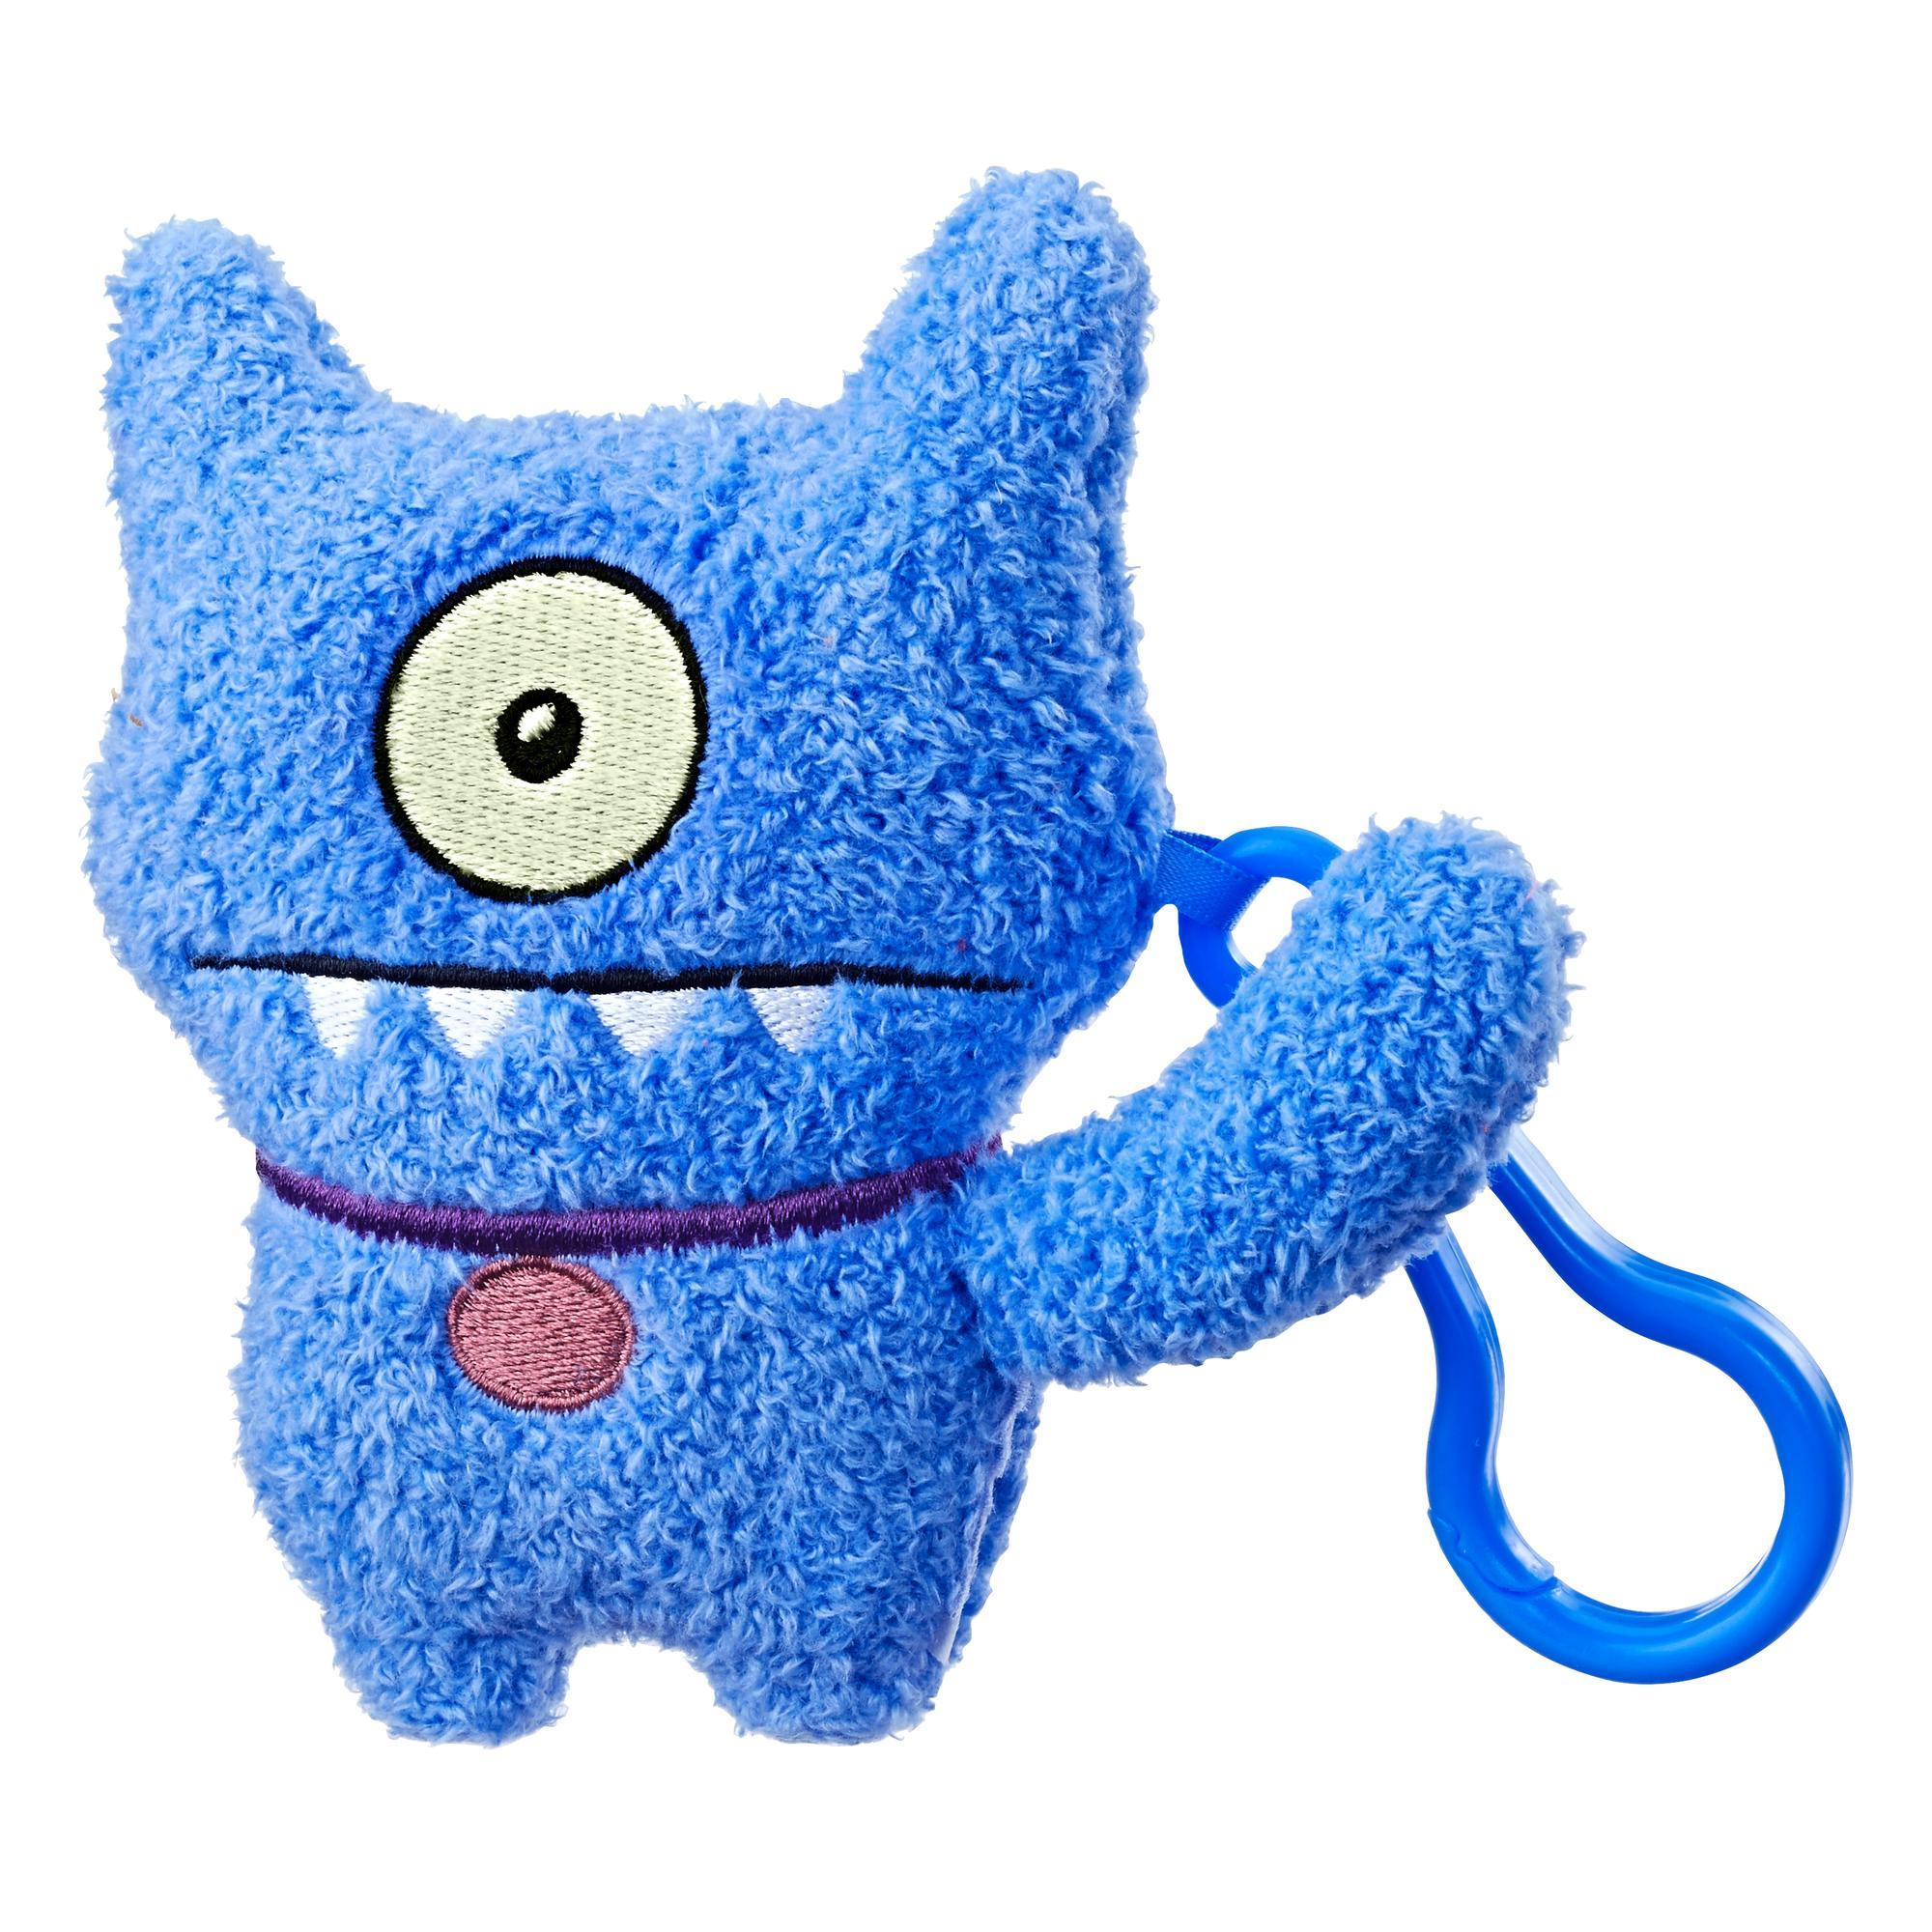 UglyDolls Ugly Dog Para Levar - Brinquedo de Pelúcia de 13 cm